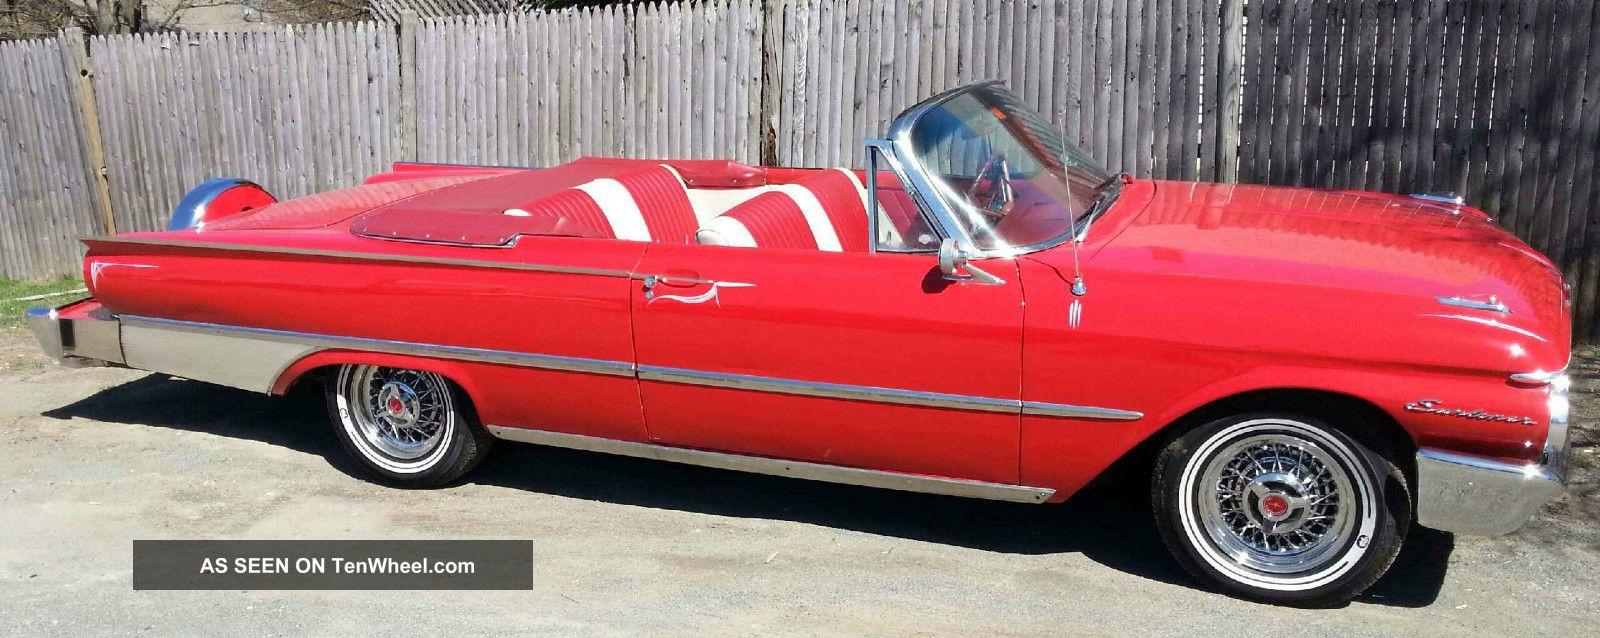 1961 Ford Galaxie Sunliner Convertiable ( ) Galaxie photo